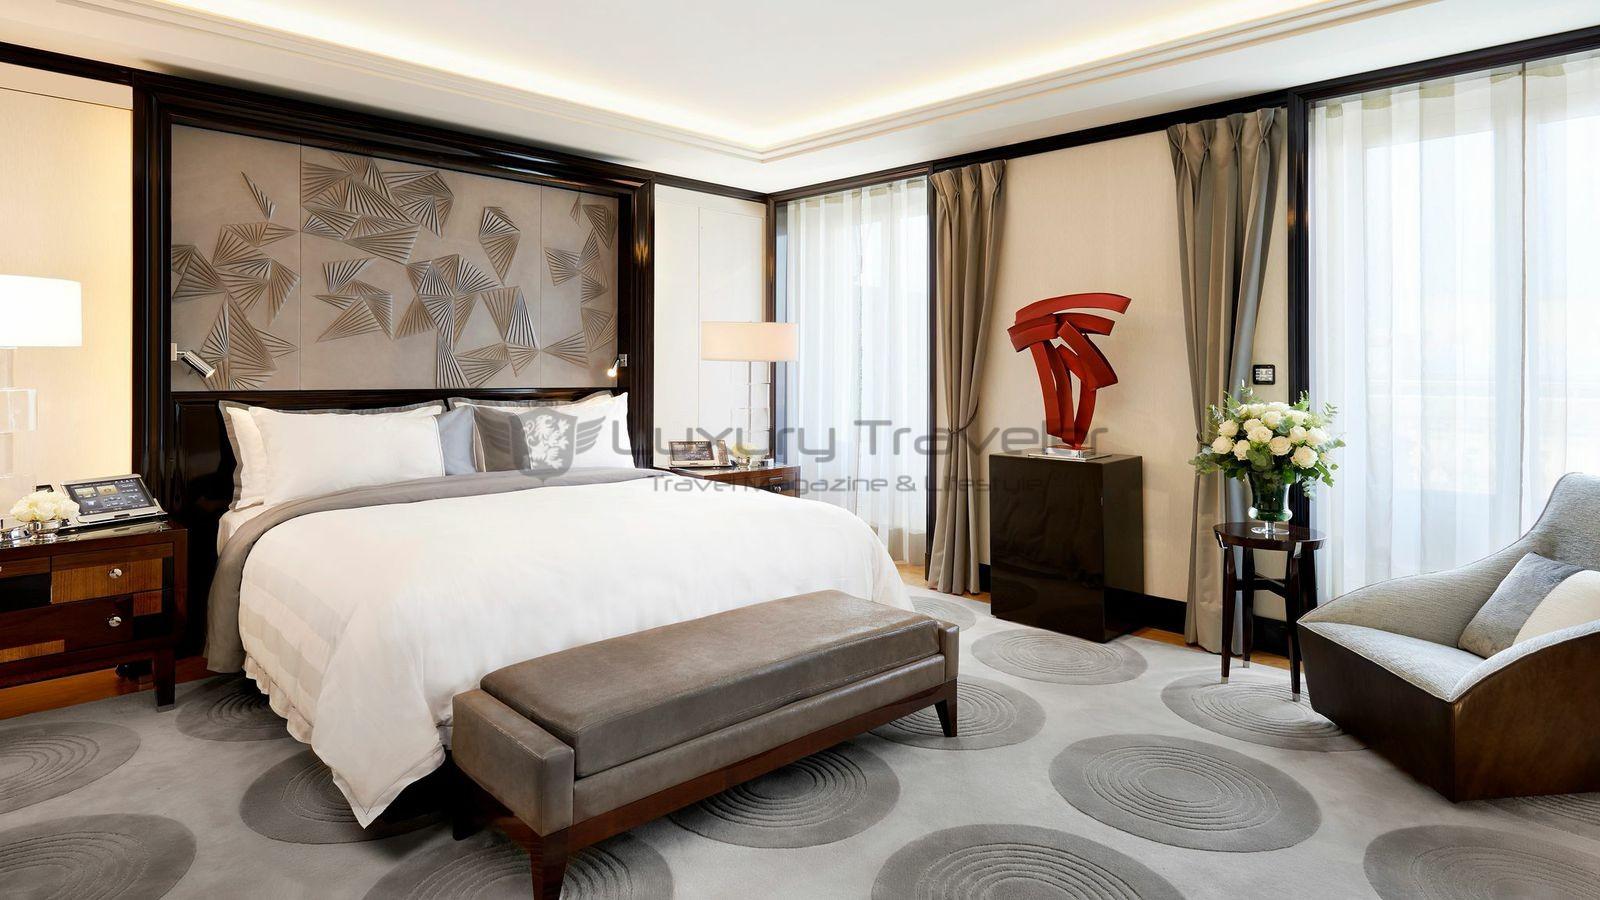 Plain Star Hotel Bedroom I Throughout Design Decorating